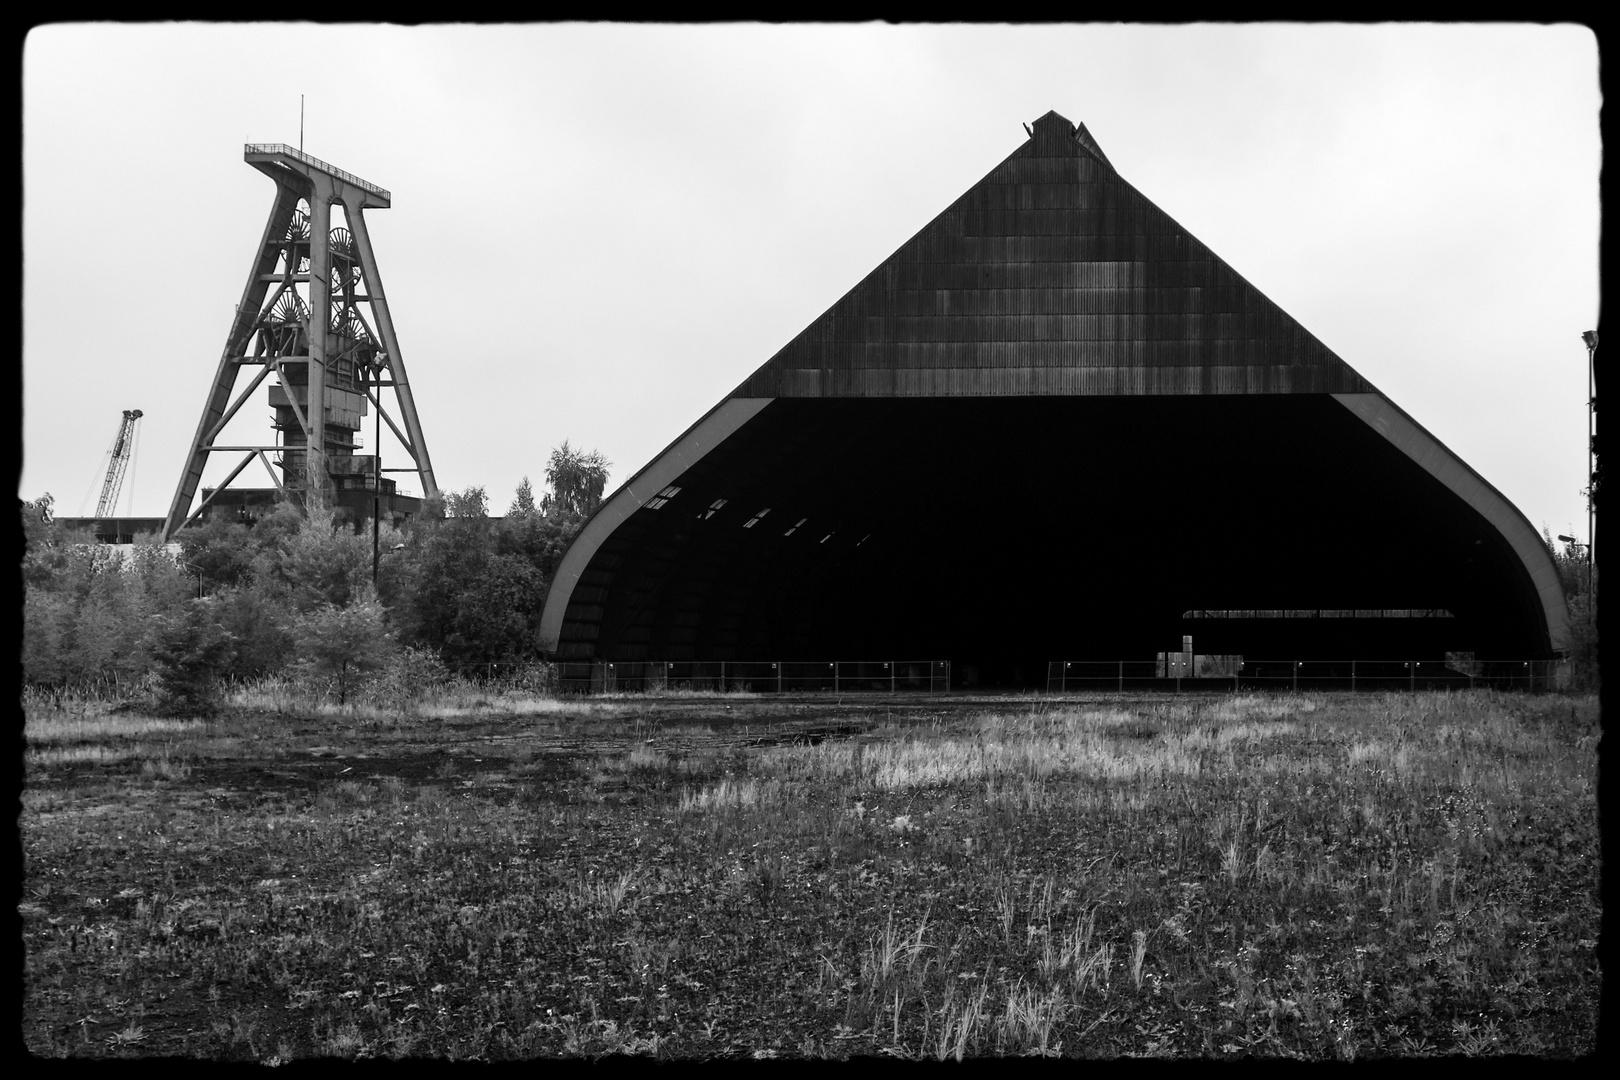 Industriebrachen - Lohberg I